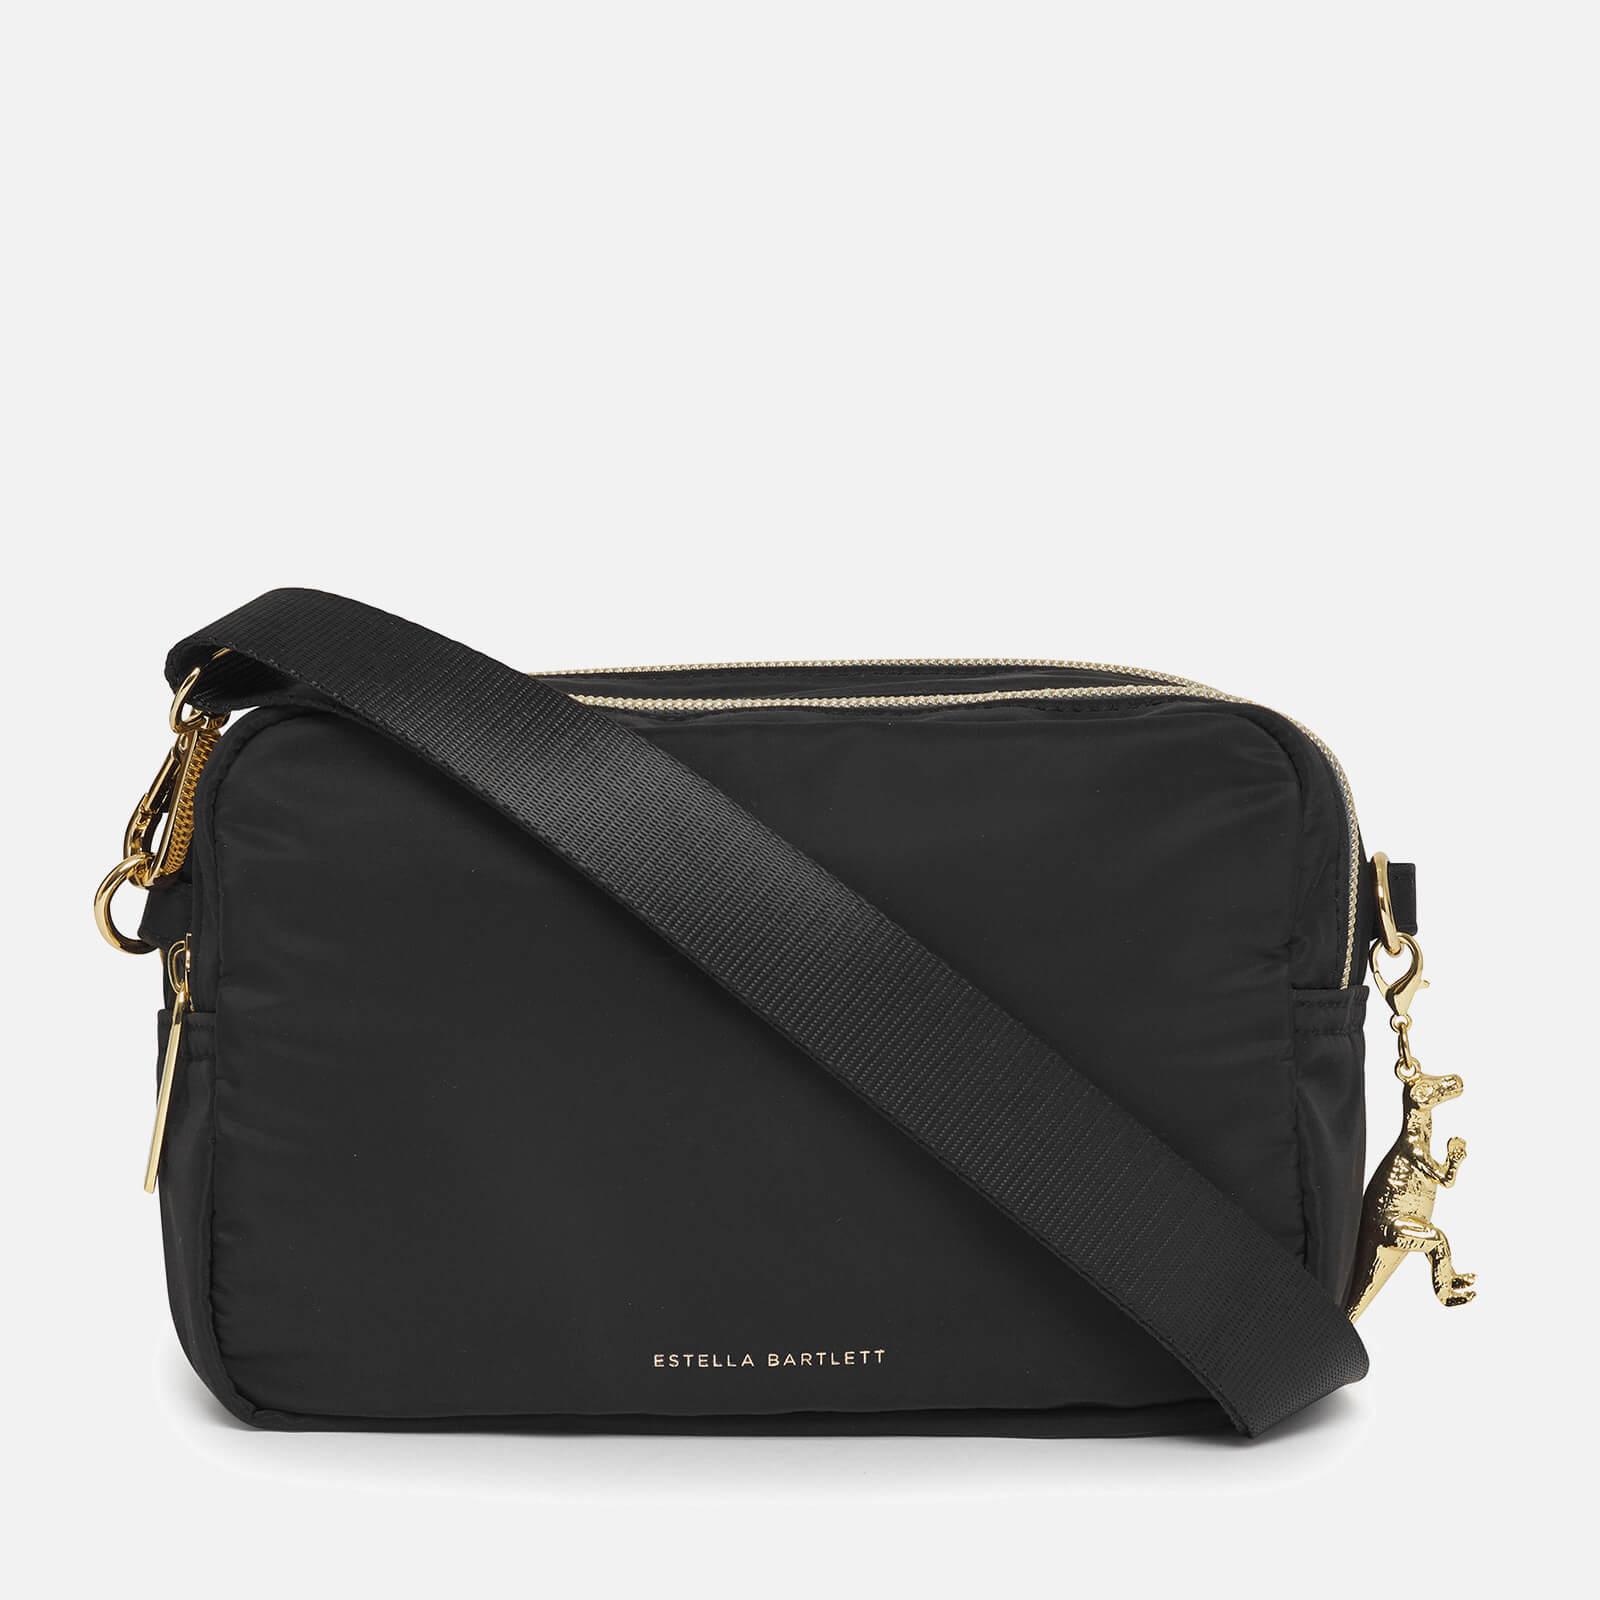 Estella Bartlett Women's The Holland Double Cross Body Bag - Black/Nylon/Black